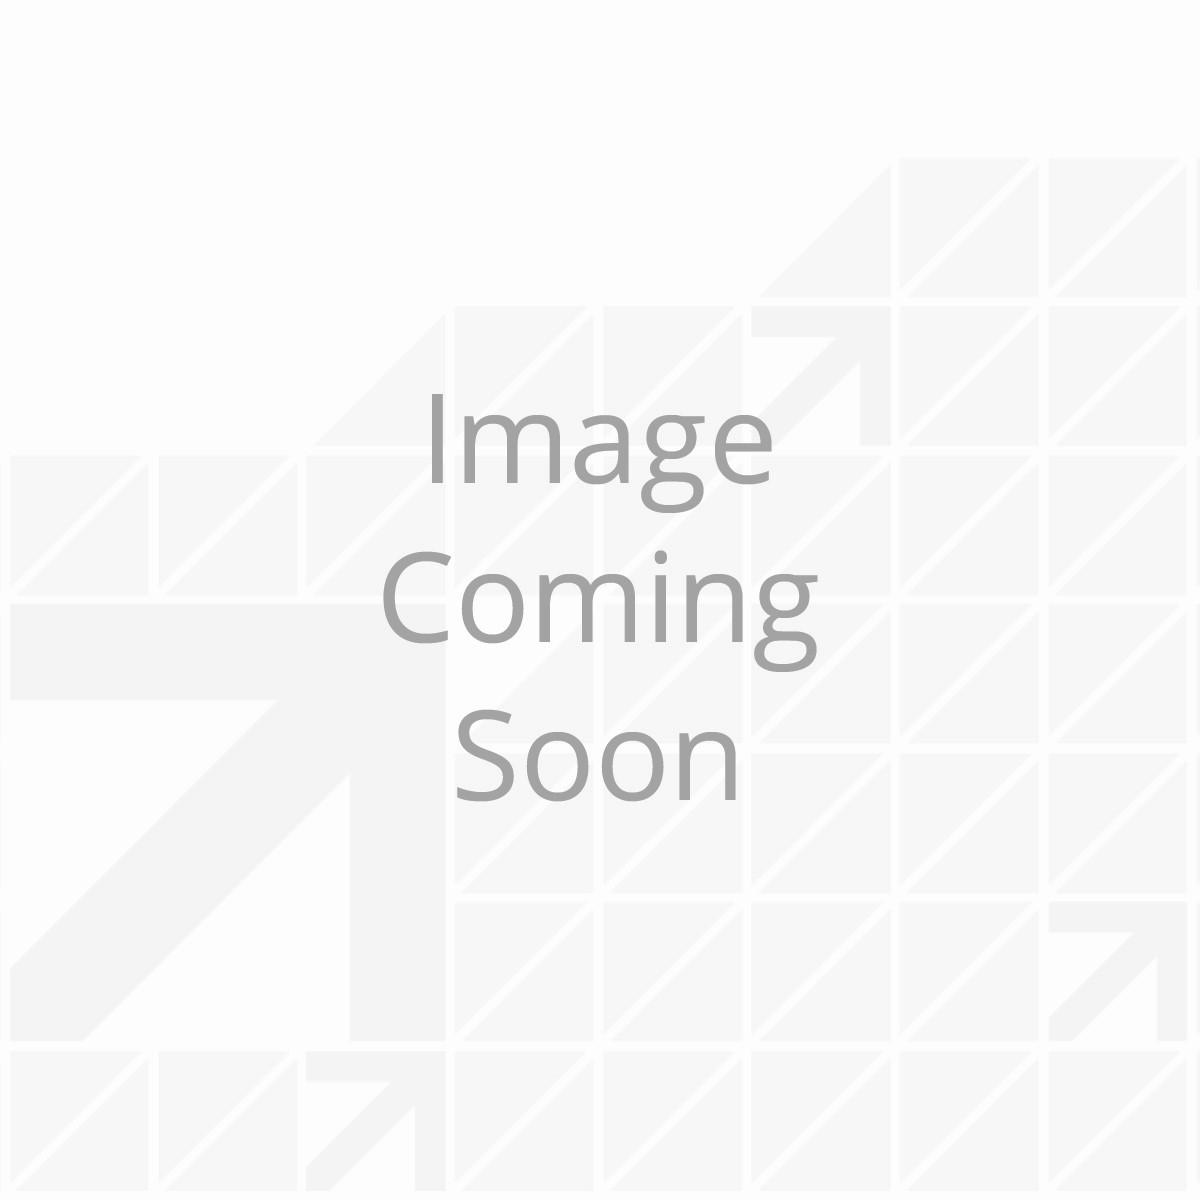 FSRE17SA-BL_1.png